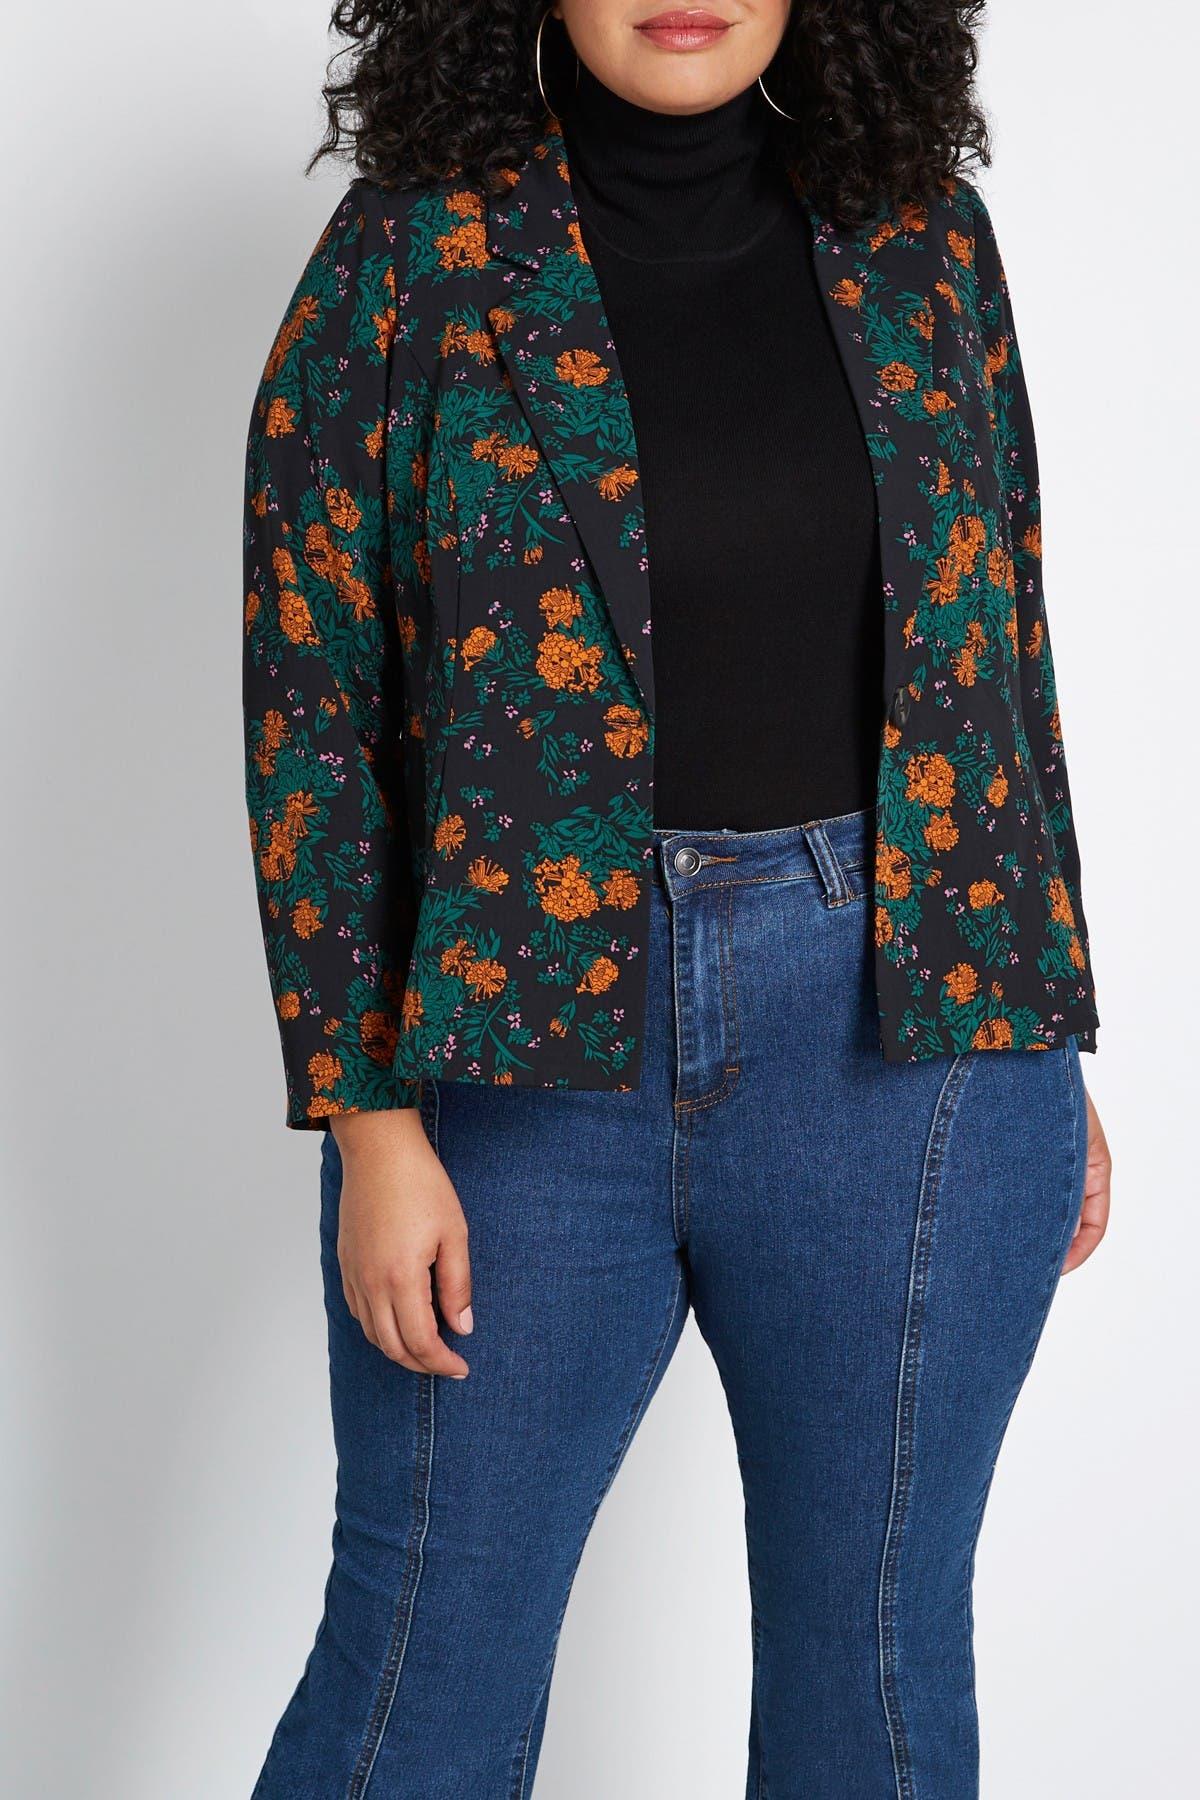 Image of MODCLOTH Business Savvy Floral Peplum Blazer